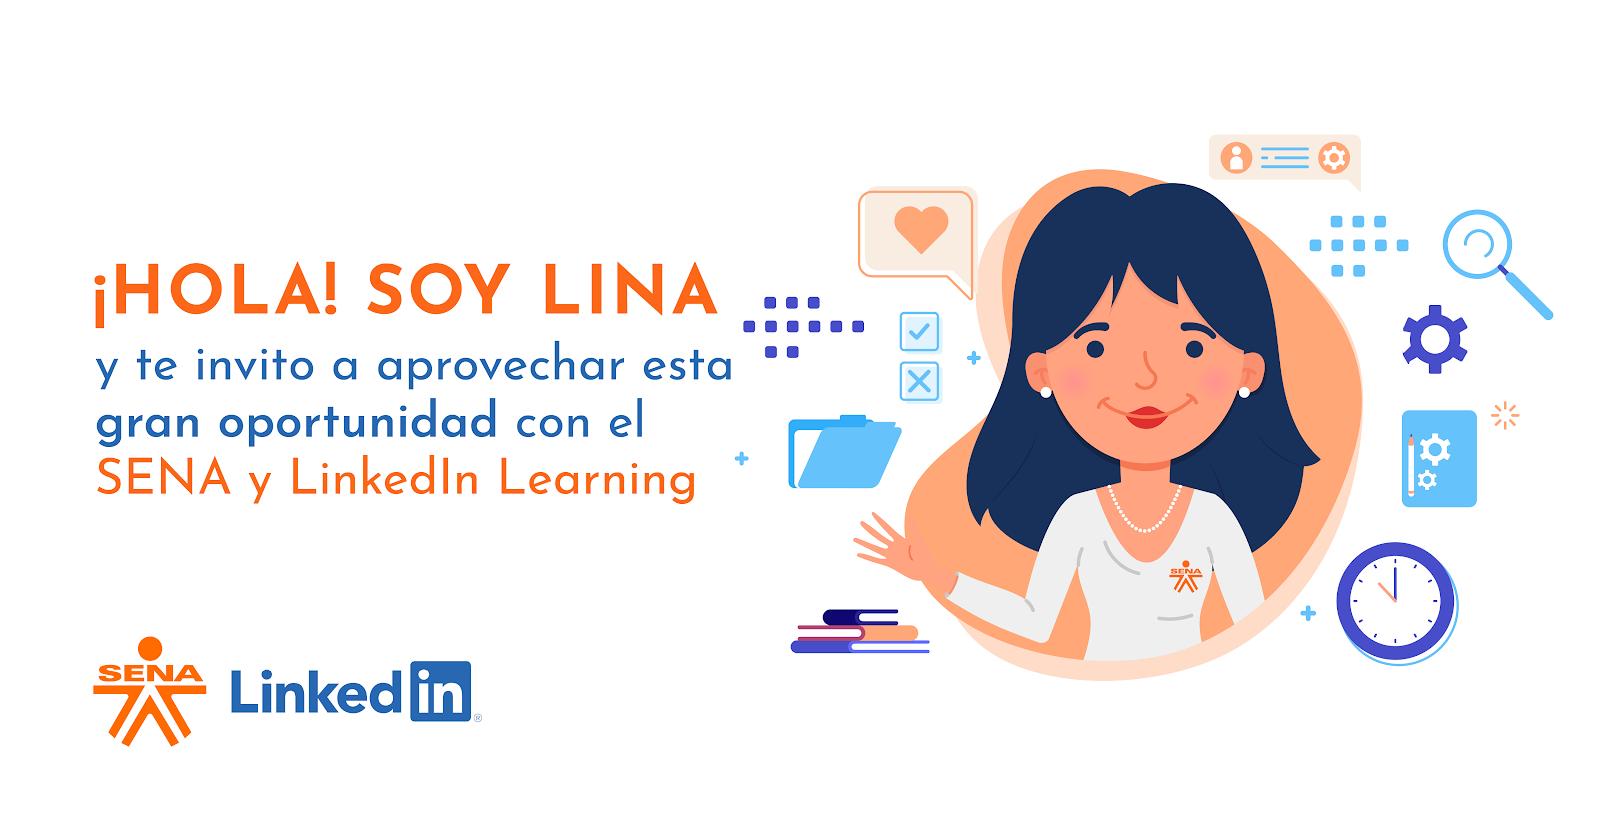 Aprendiz activa tu licencia de LinkedIn